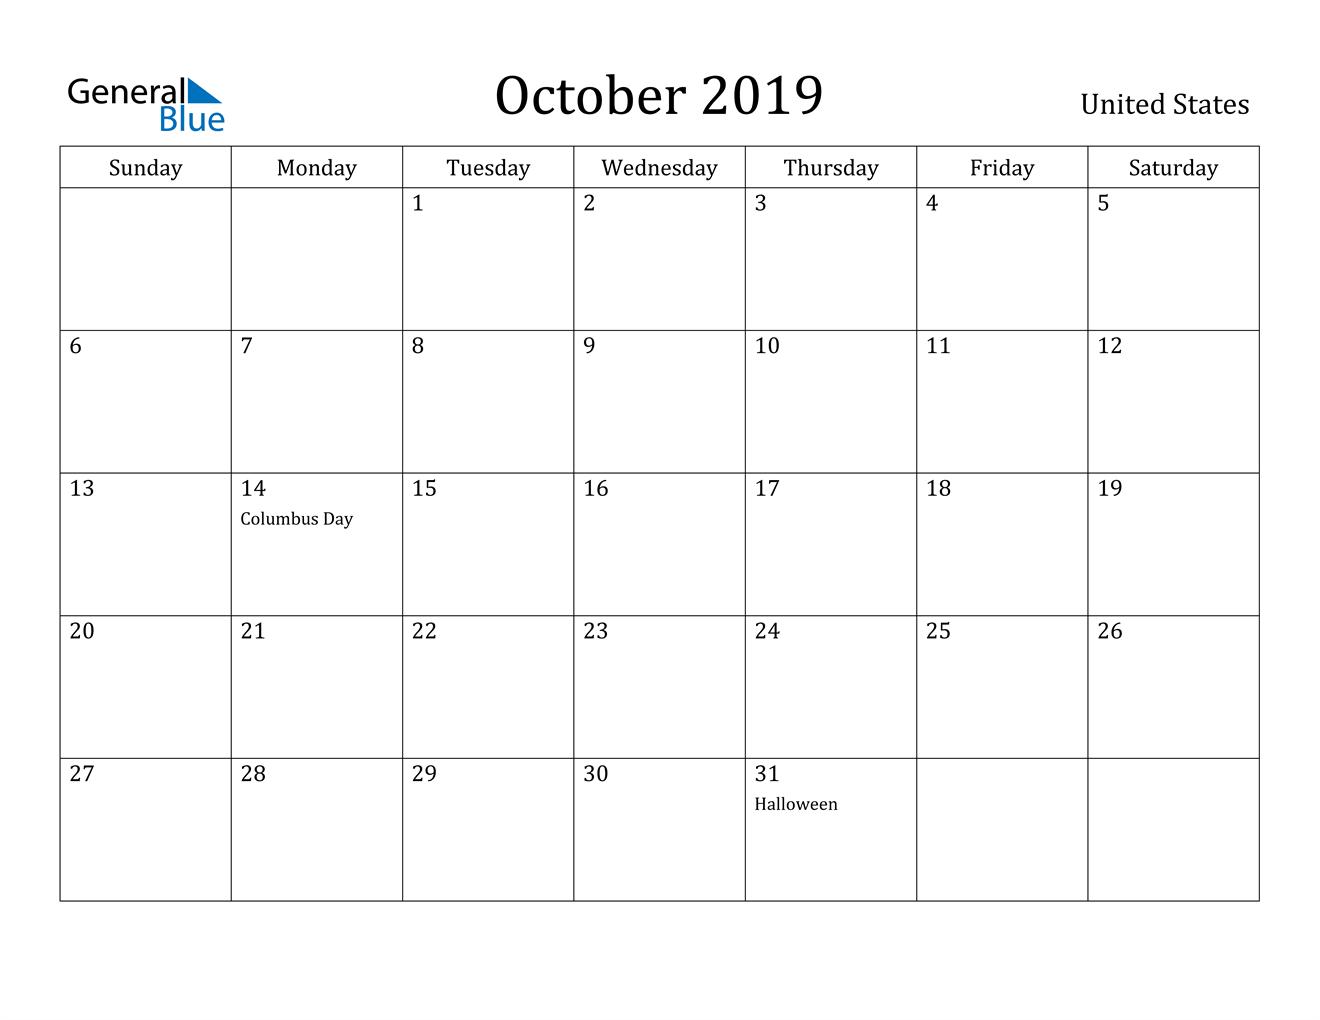 Image of October 2019 United States Calendar with Holidays Calendar